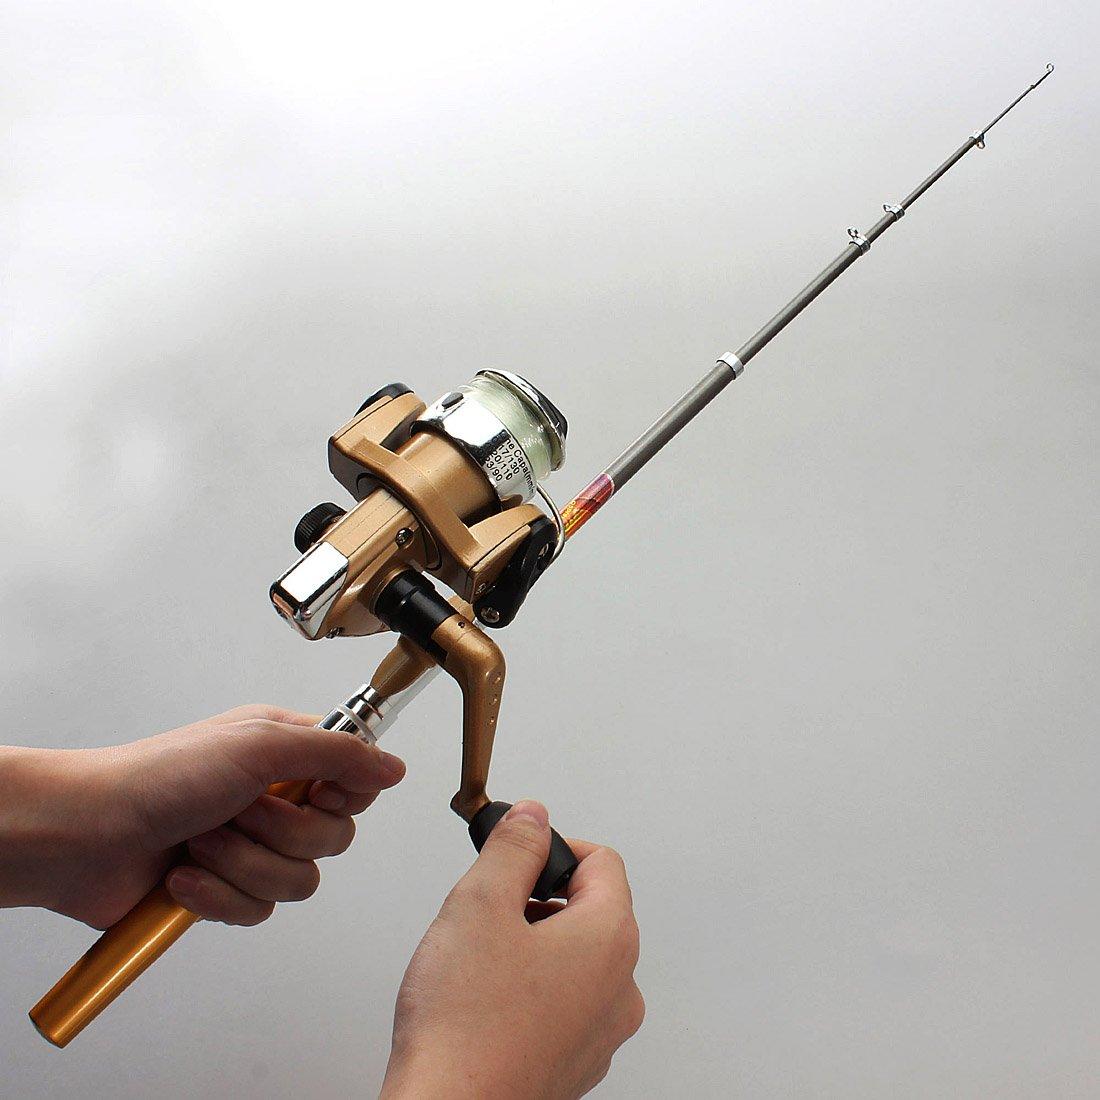 W6 telescopic fishing rod portable pen shape 1m reel for Pen fishing rod